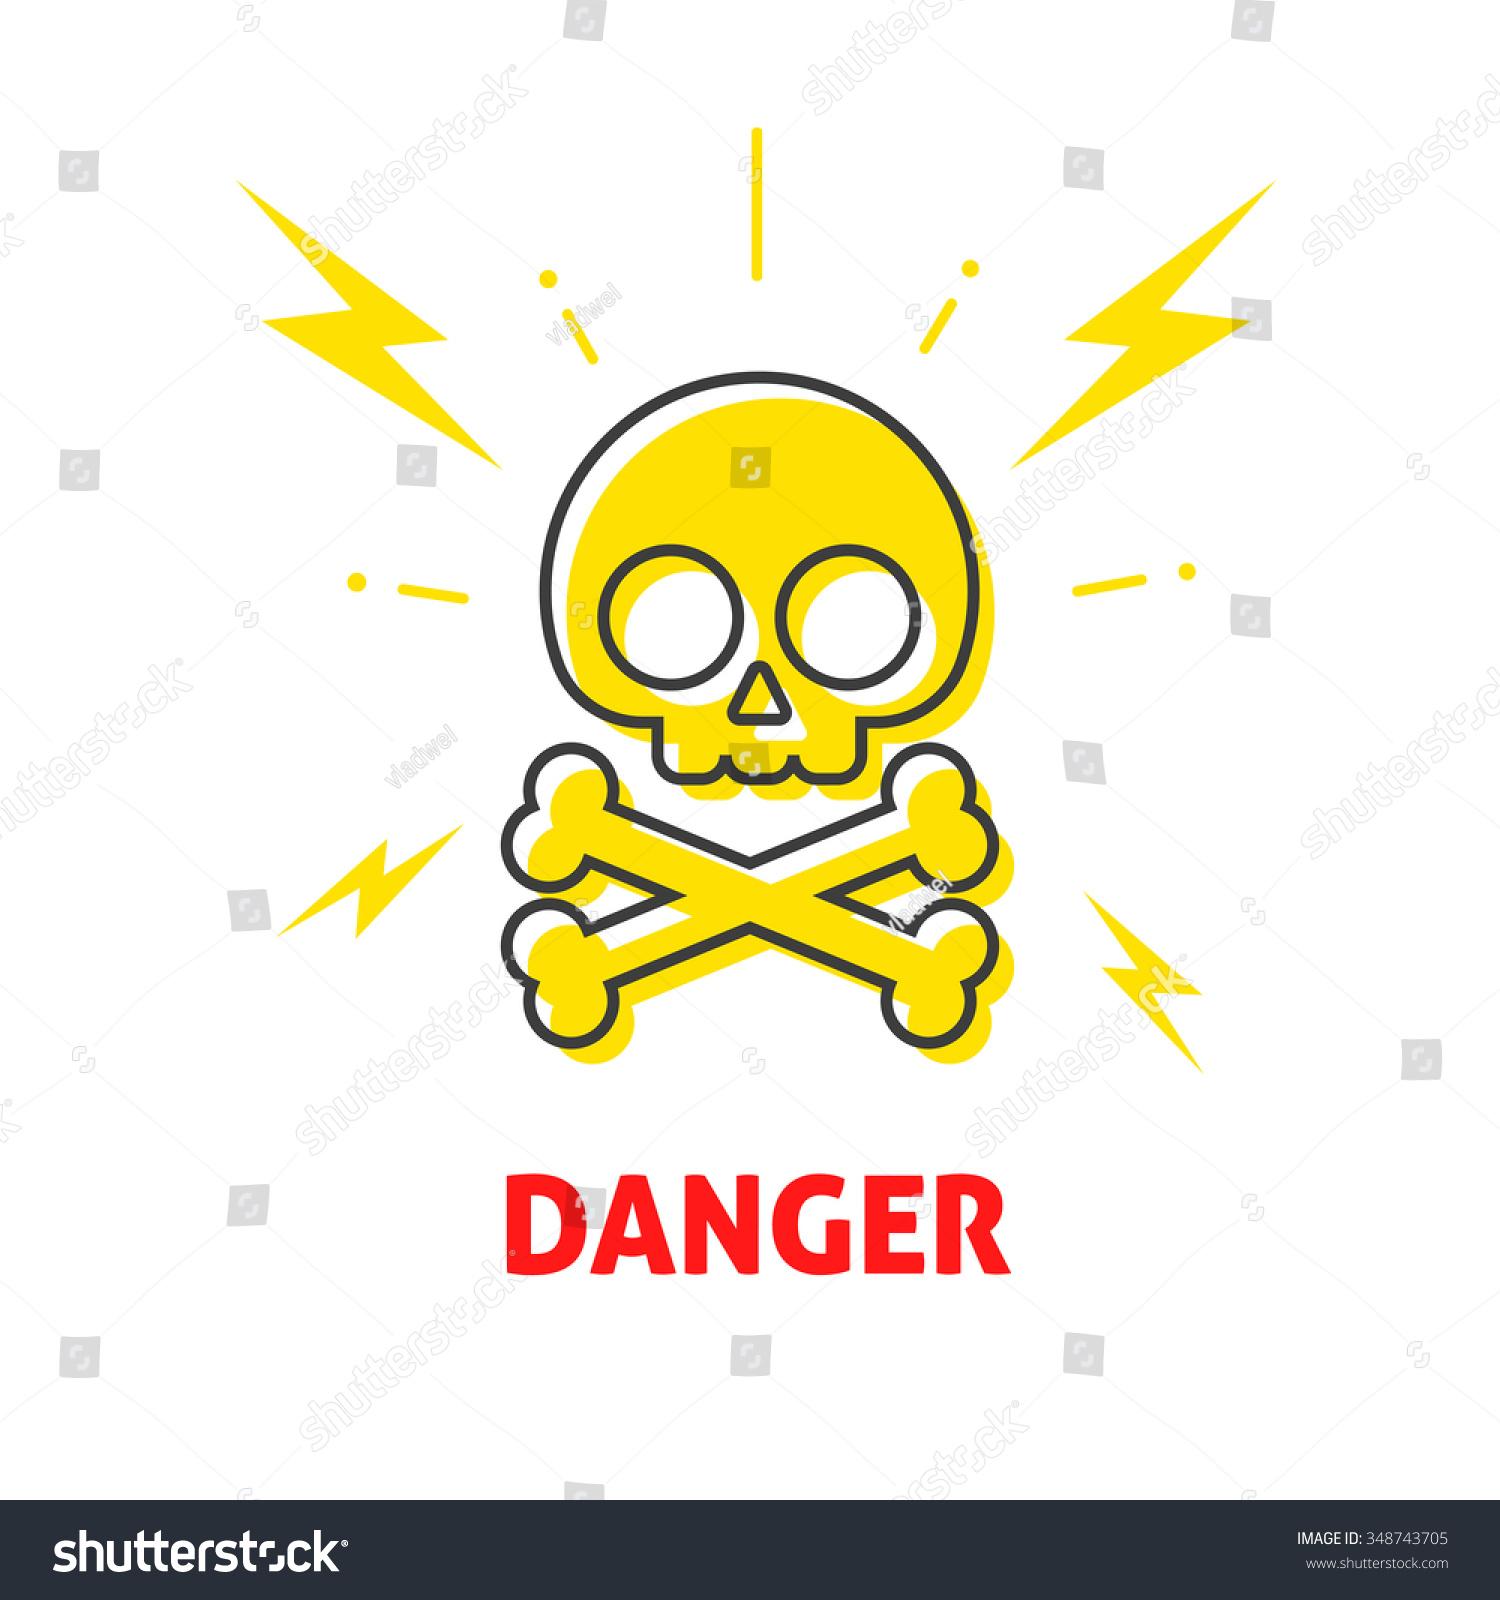 Danger Electricity Sign Vector